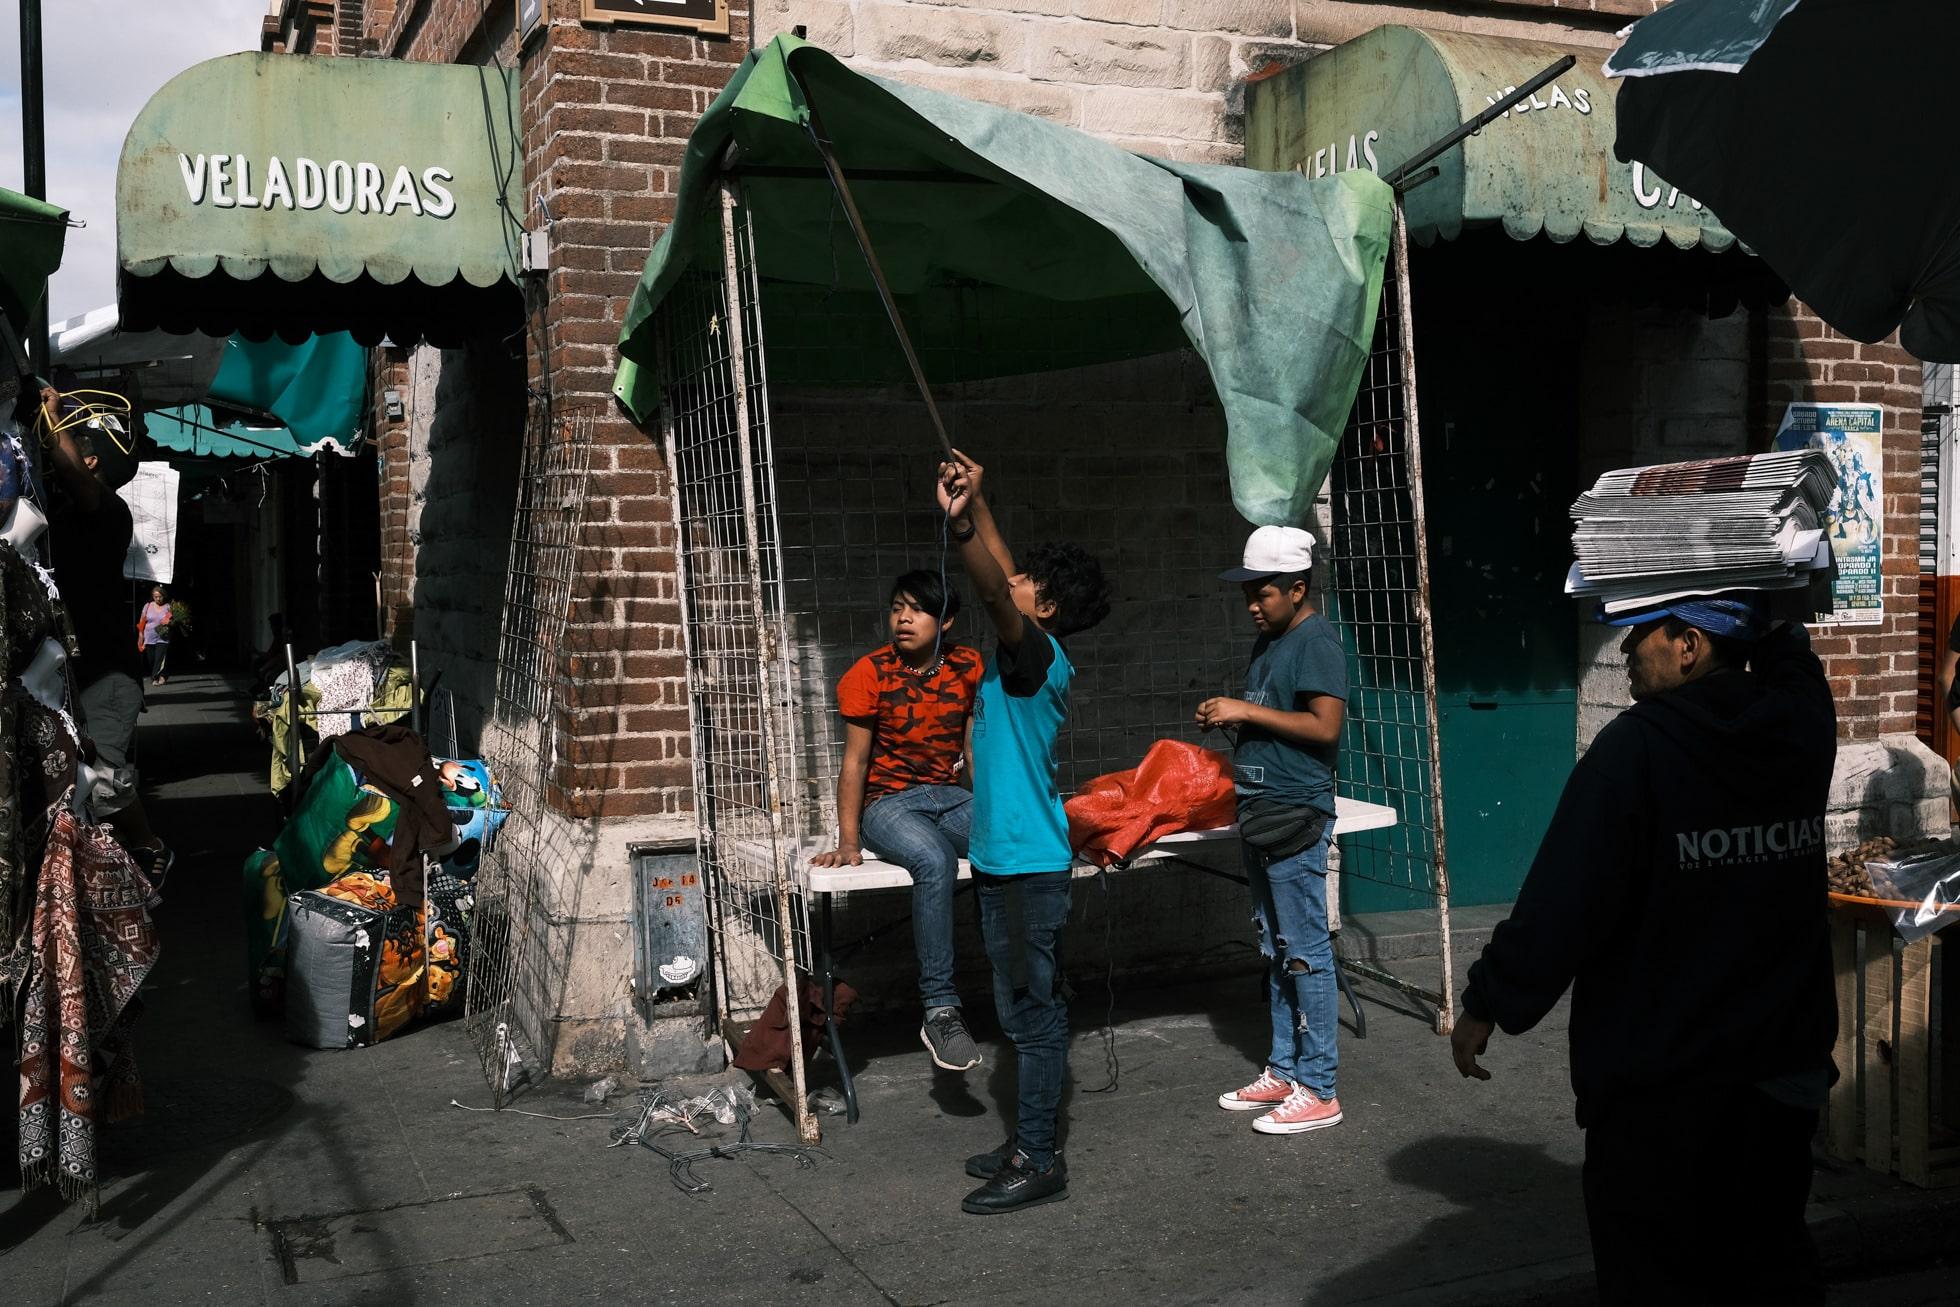 fujifilm-x-pro3-mexico-street-photography-32